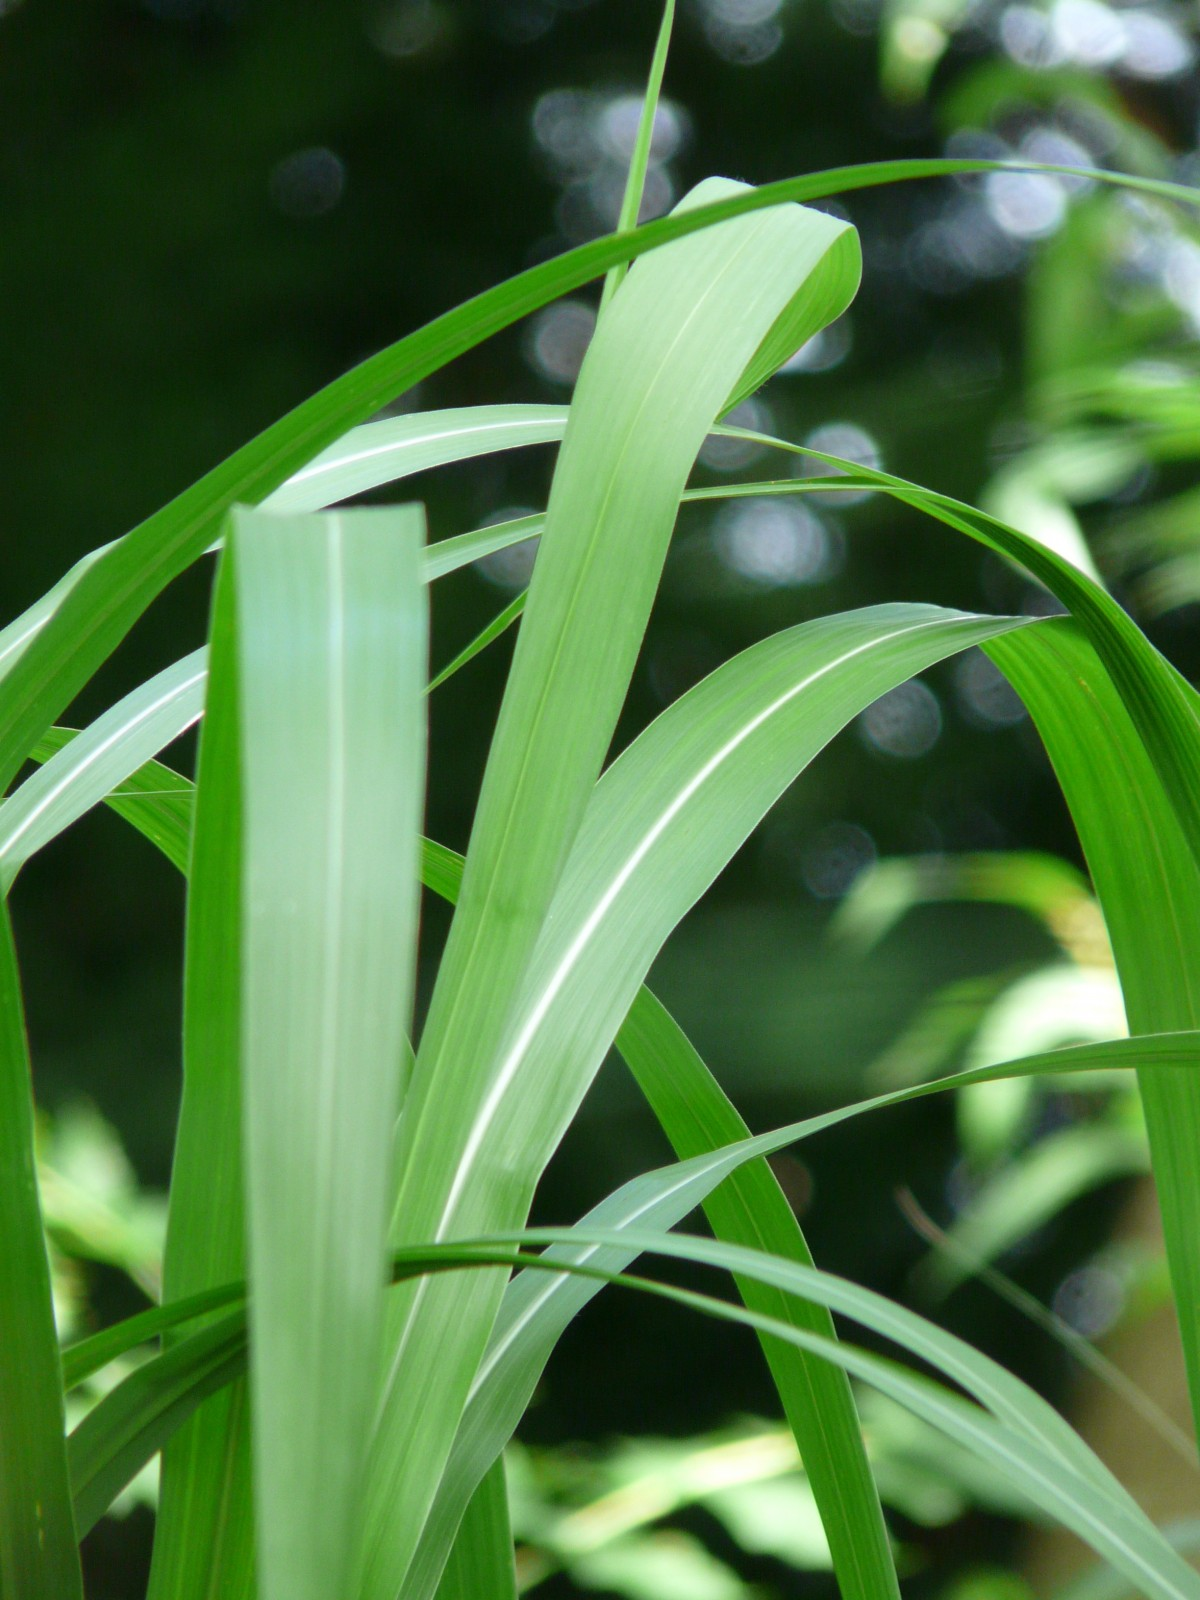 Gambar  menanam daun bunga Buluh hijau botani Flora